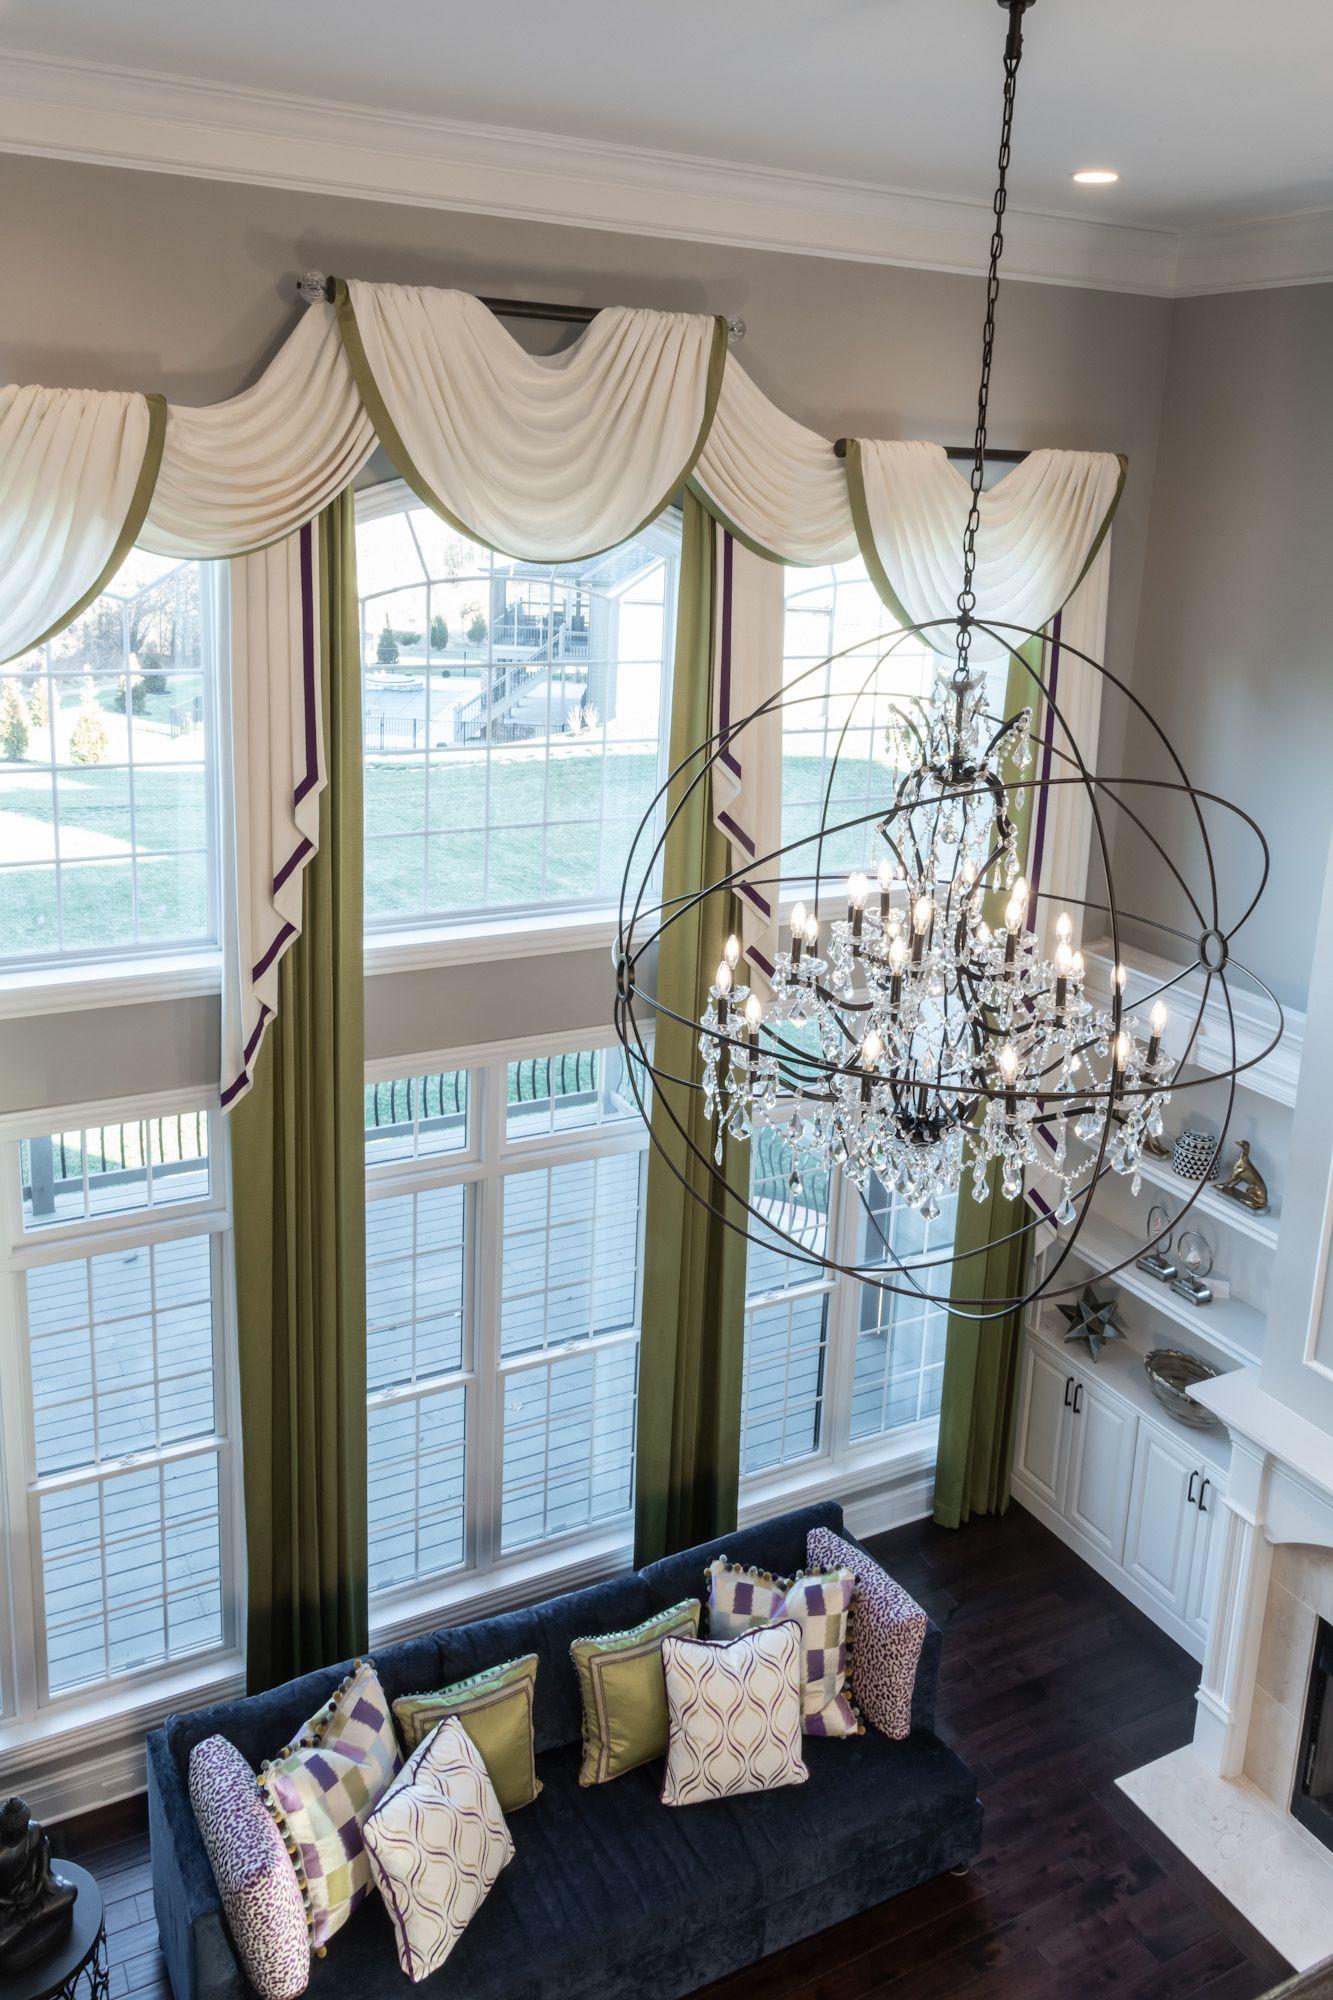 12 Story window drapes   Interior design, Window drapes, Great rooms